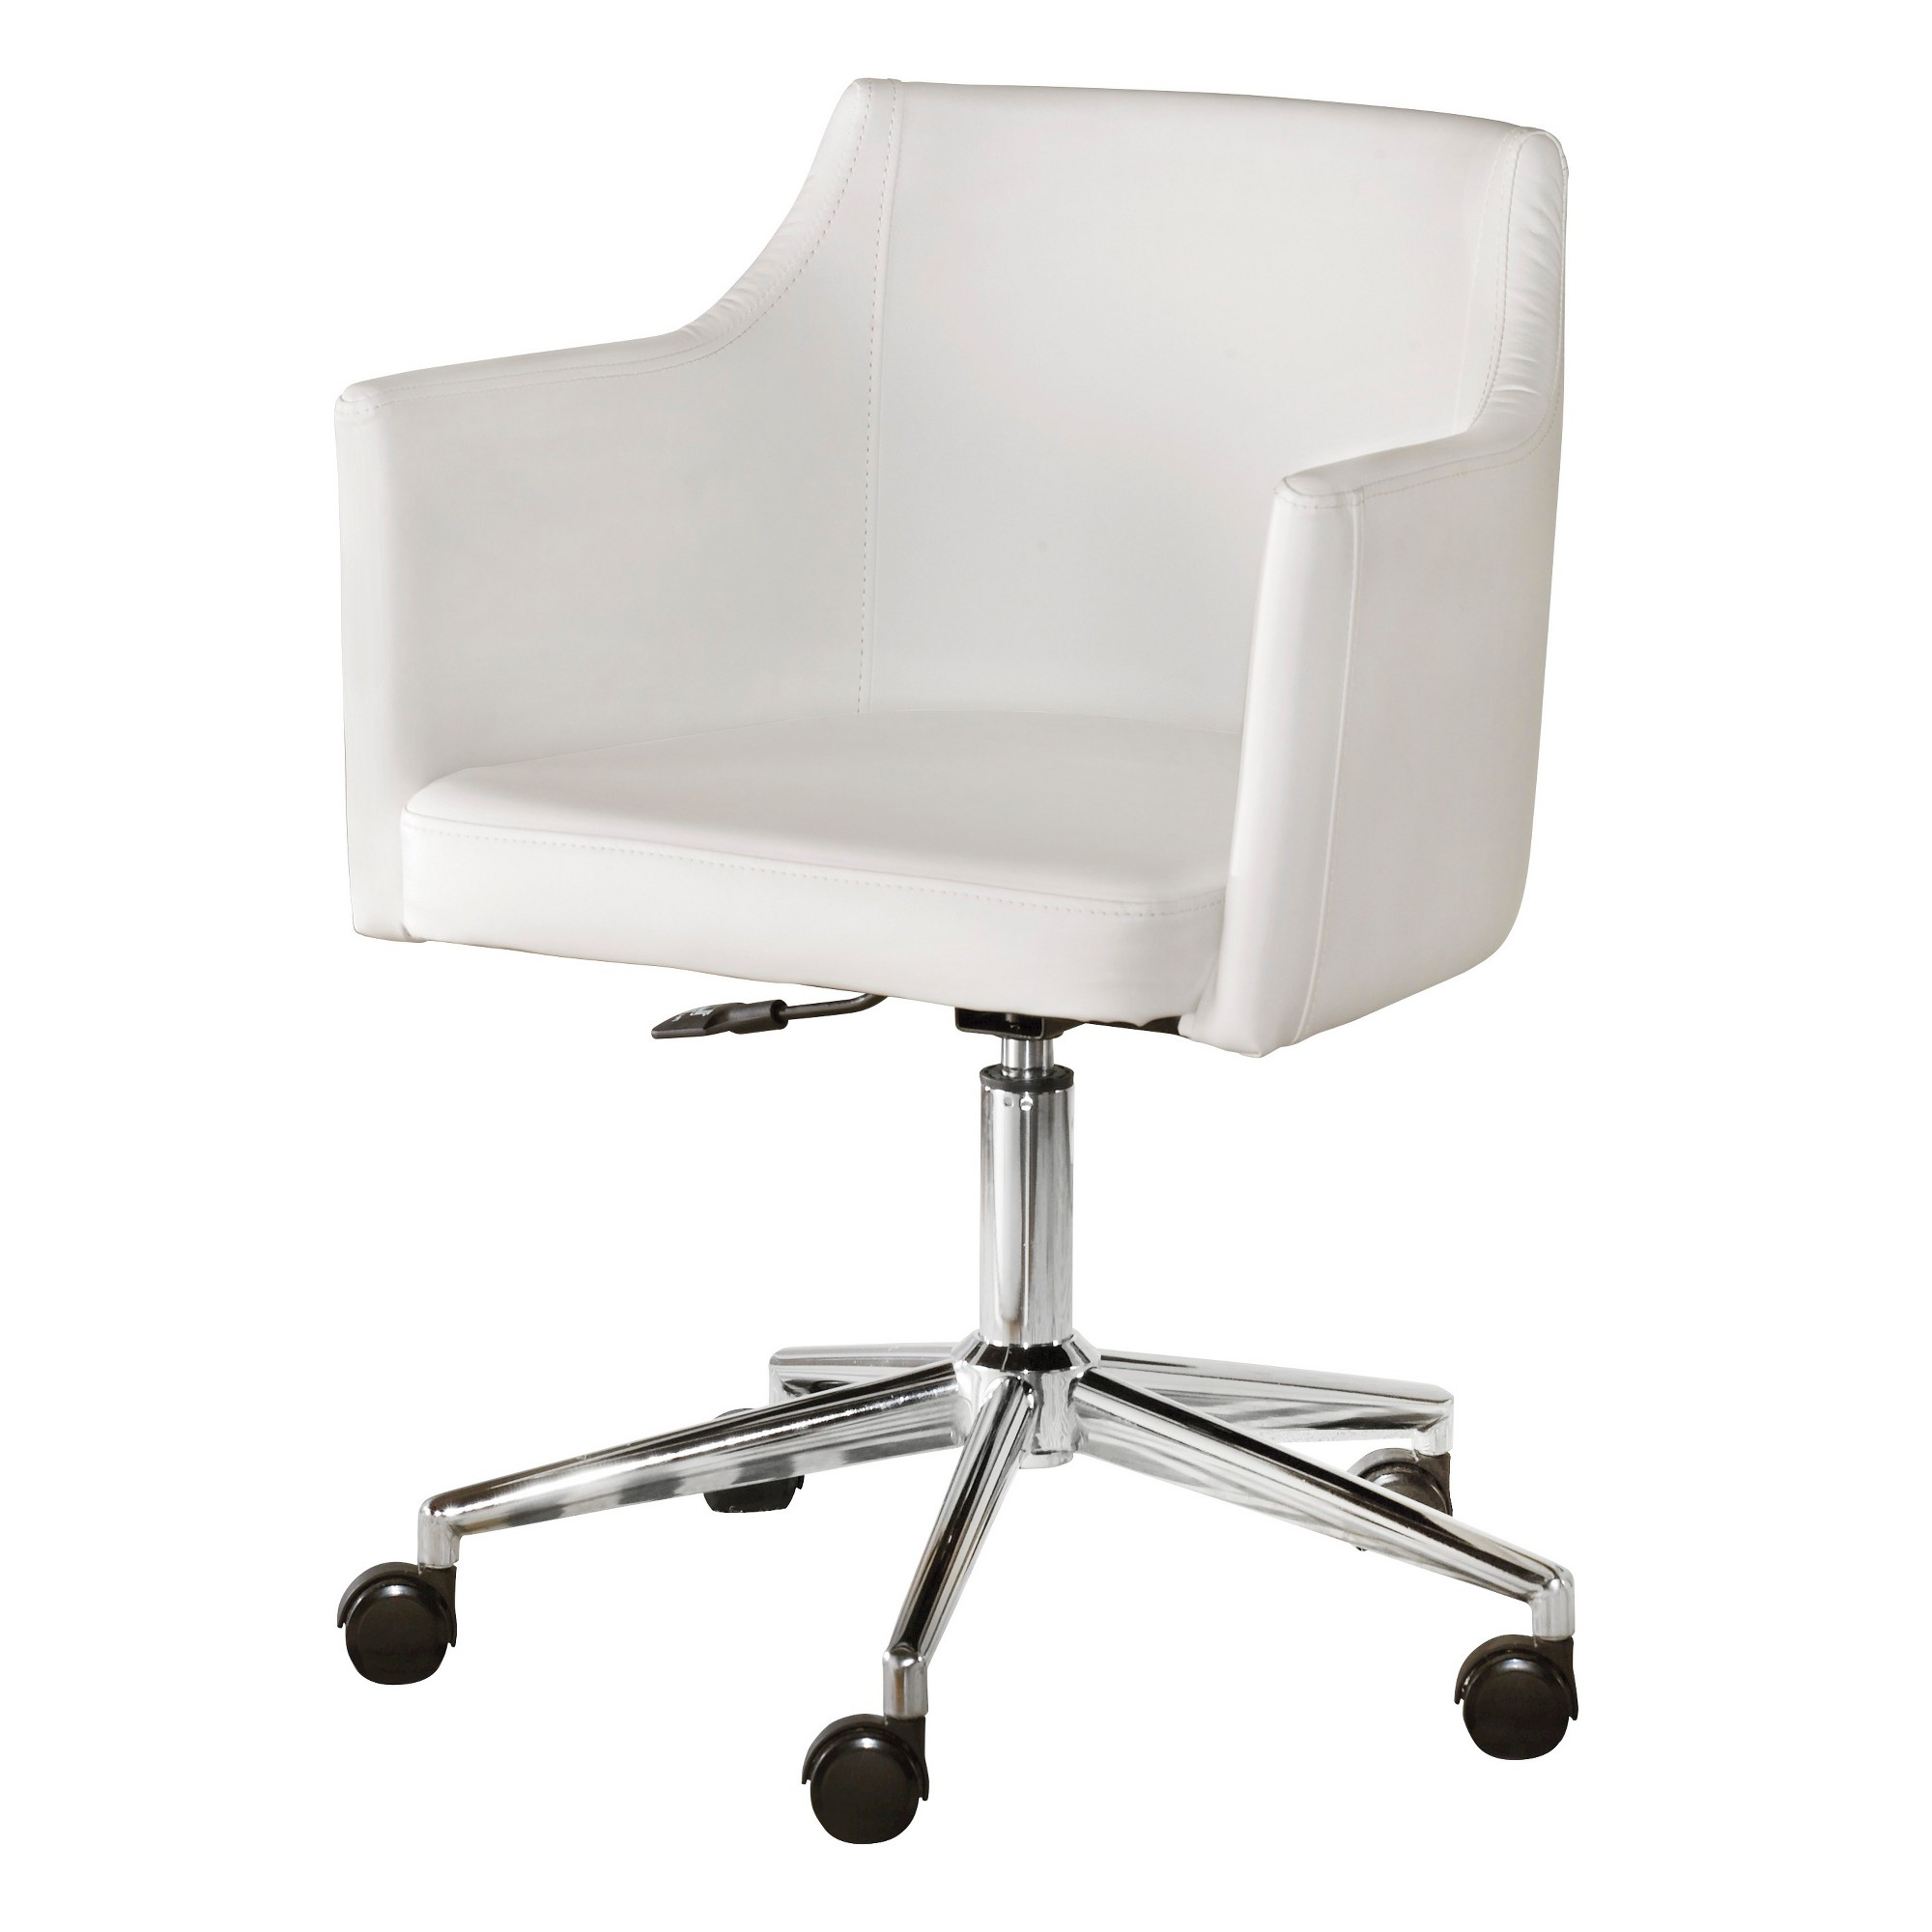 Outstanding Baraga Home Office Swivel Desk Chair White Signature Machost Co Dining Chair Design Ideas Machostcouk